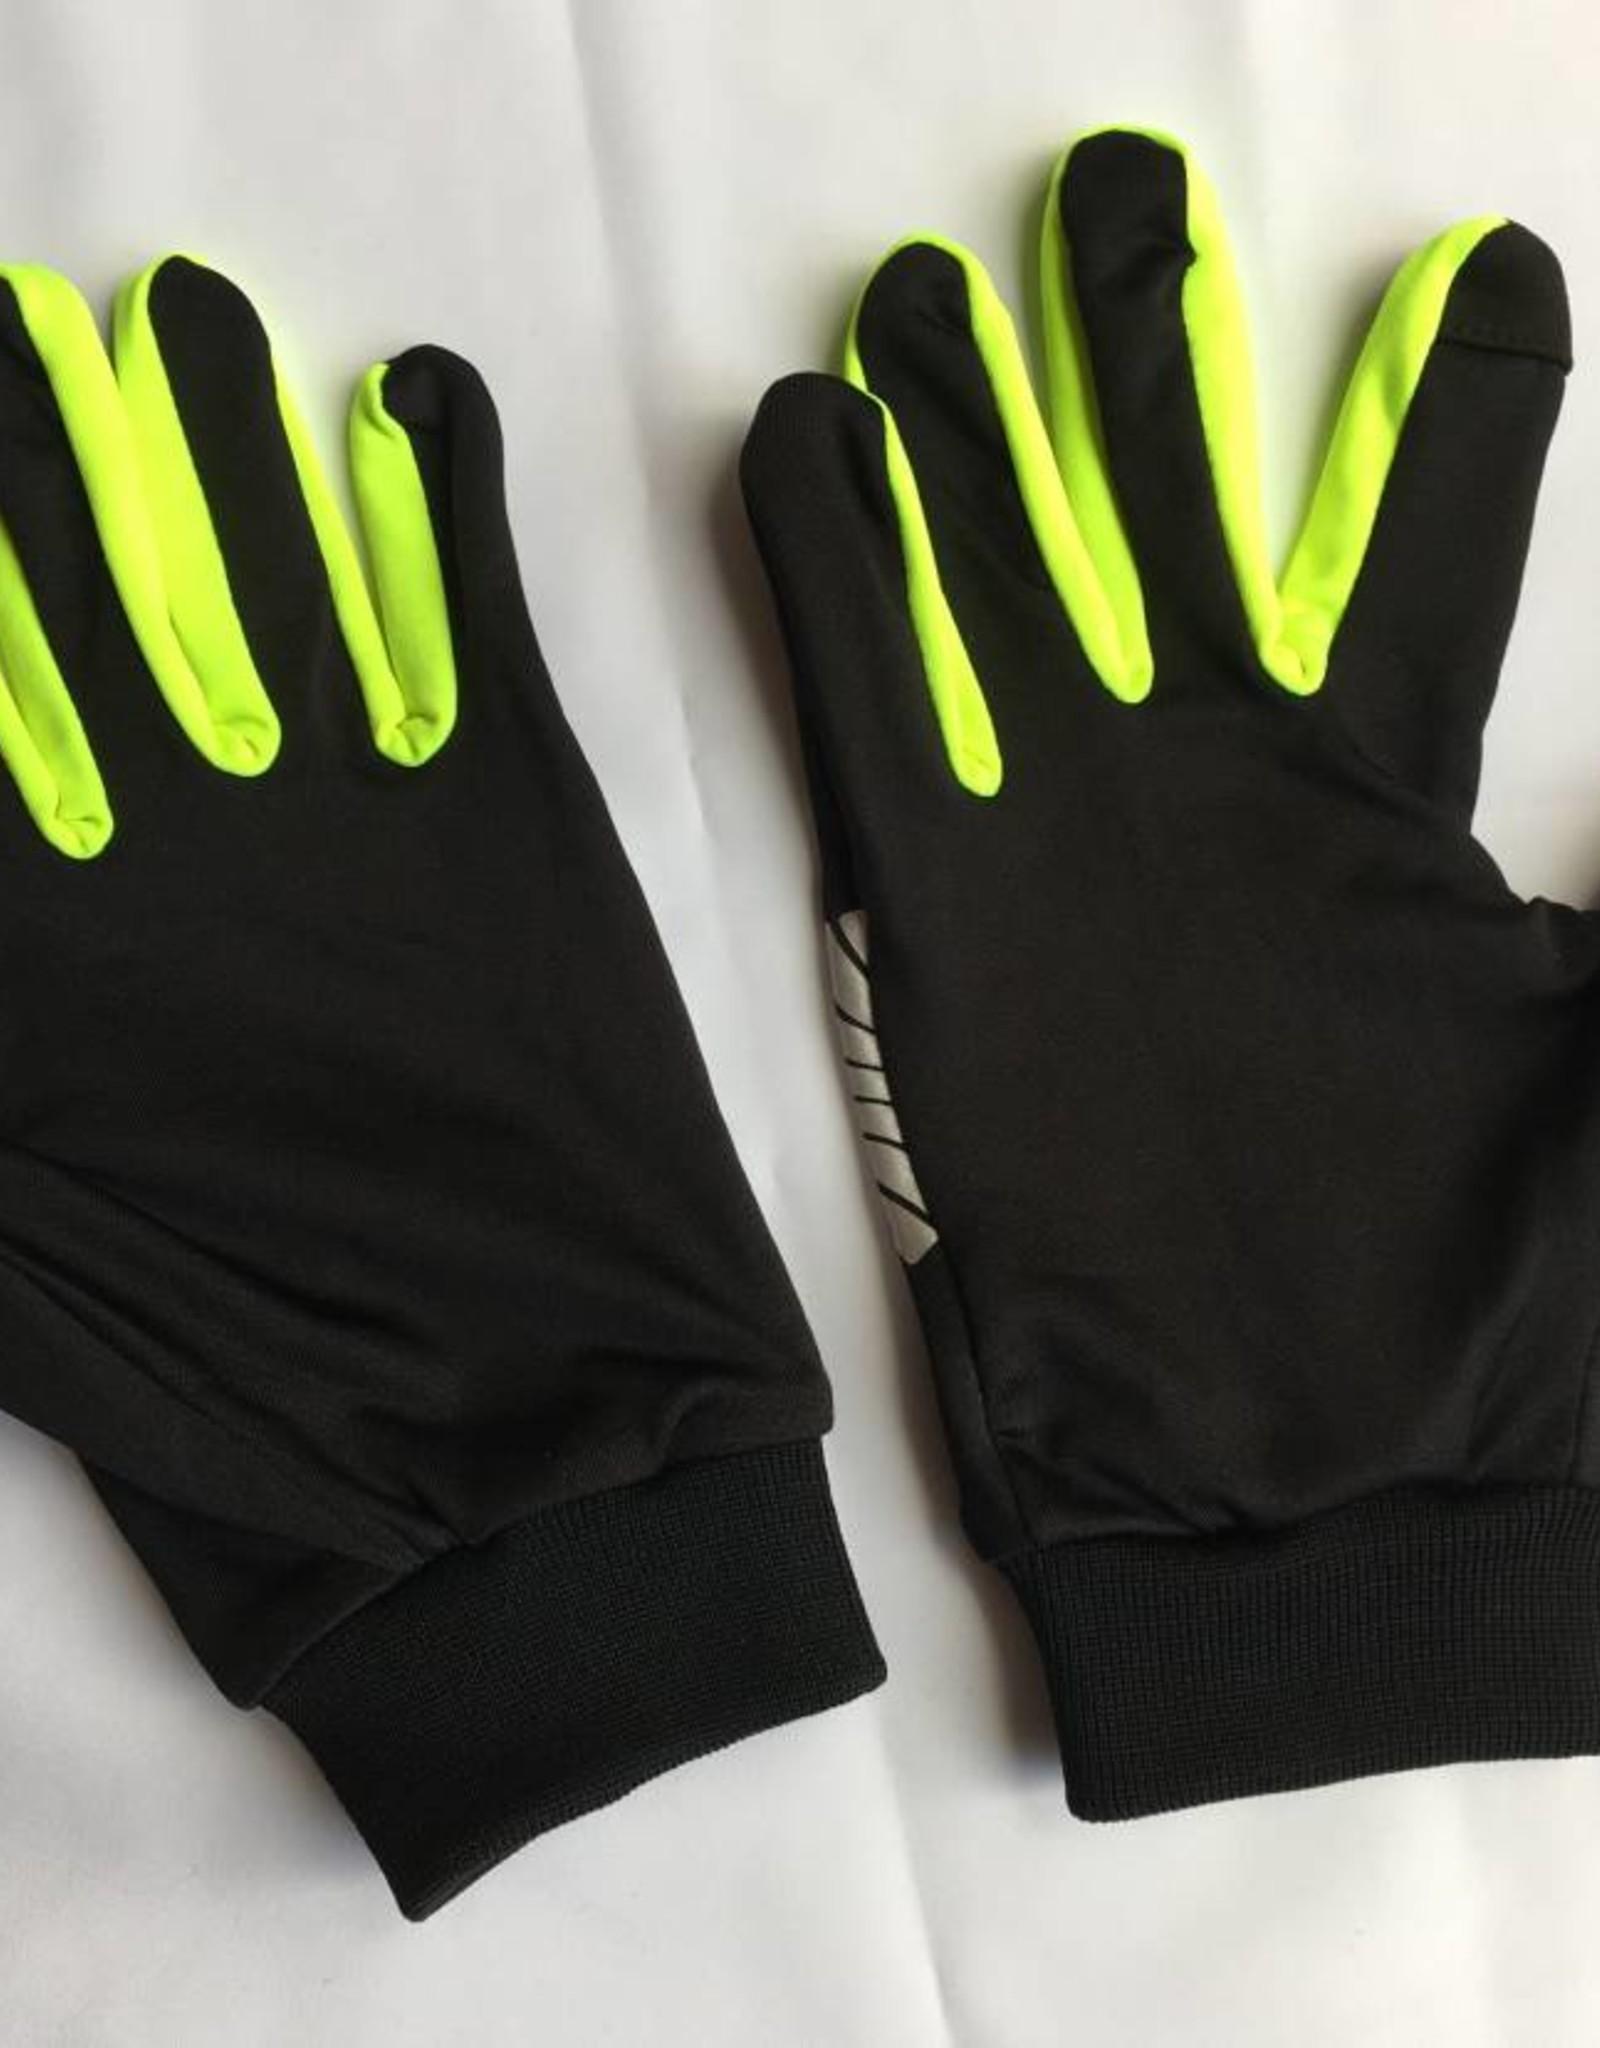 Salzmann Lightweight Reflective Glove